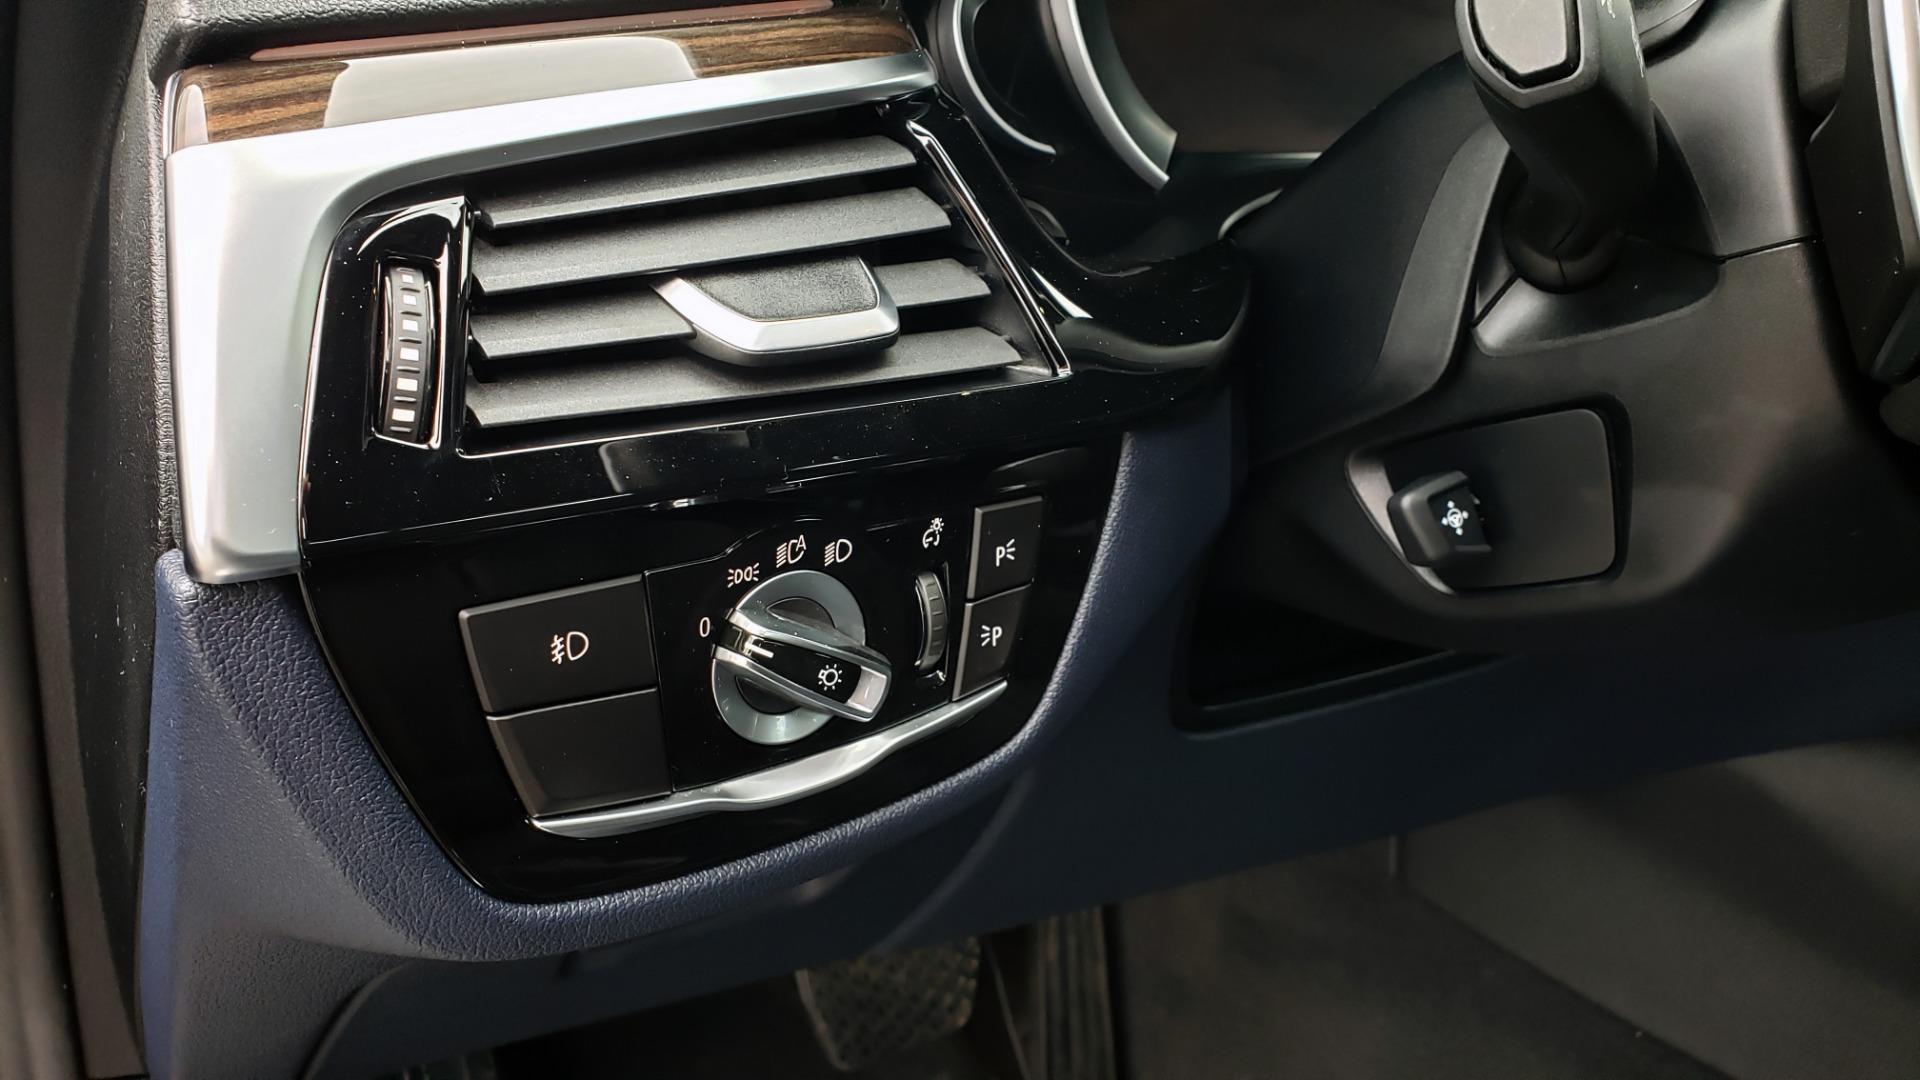 Used 2017 BMW 5 SERIES 530IXDRIVE / PREM PKG / DRVR ASST PLUS / CLD WTHR / APPLE CARPLAY for sale Sold at Formula Imports in Charlotte NC 28227 37